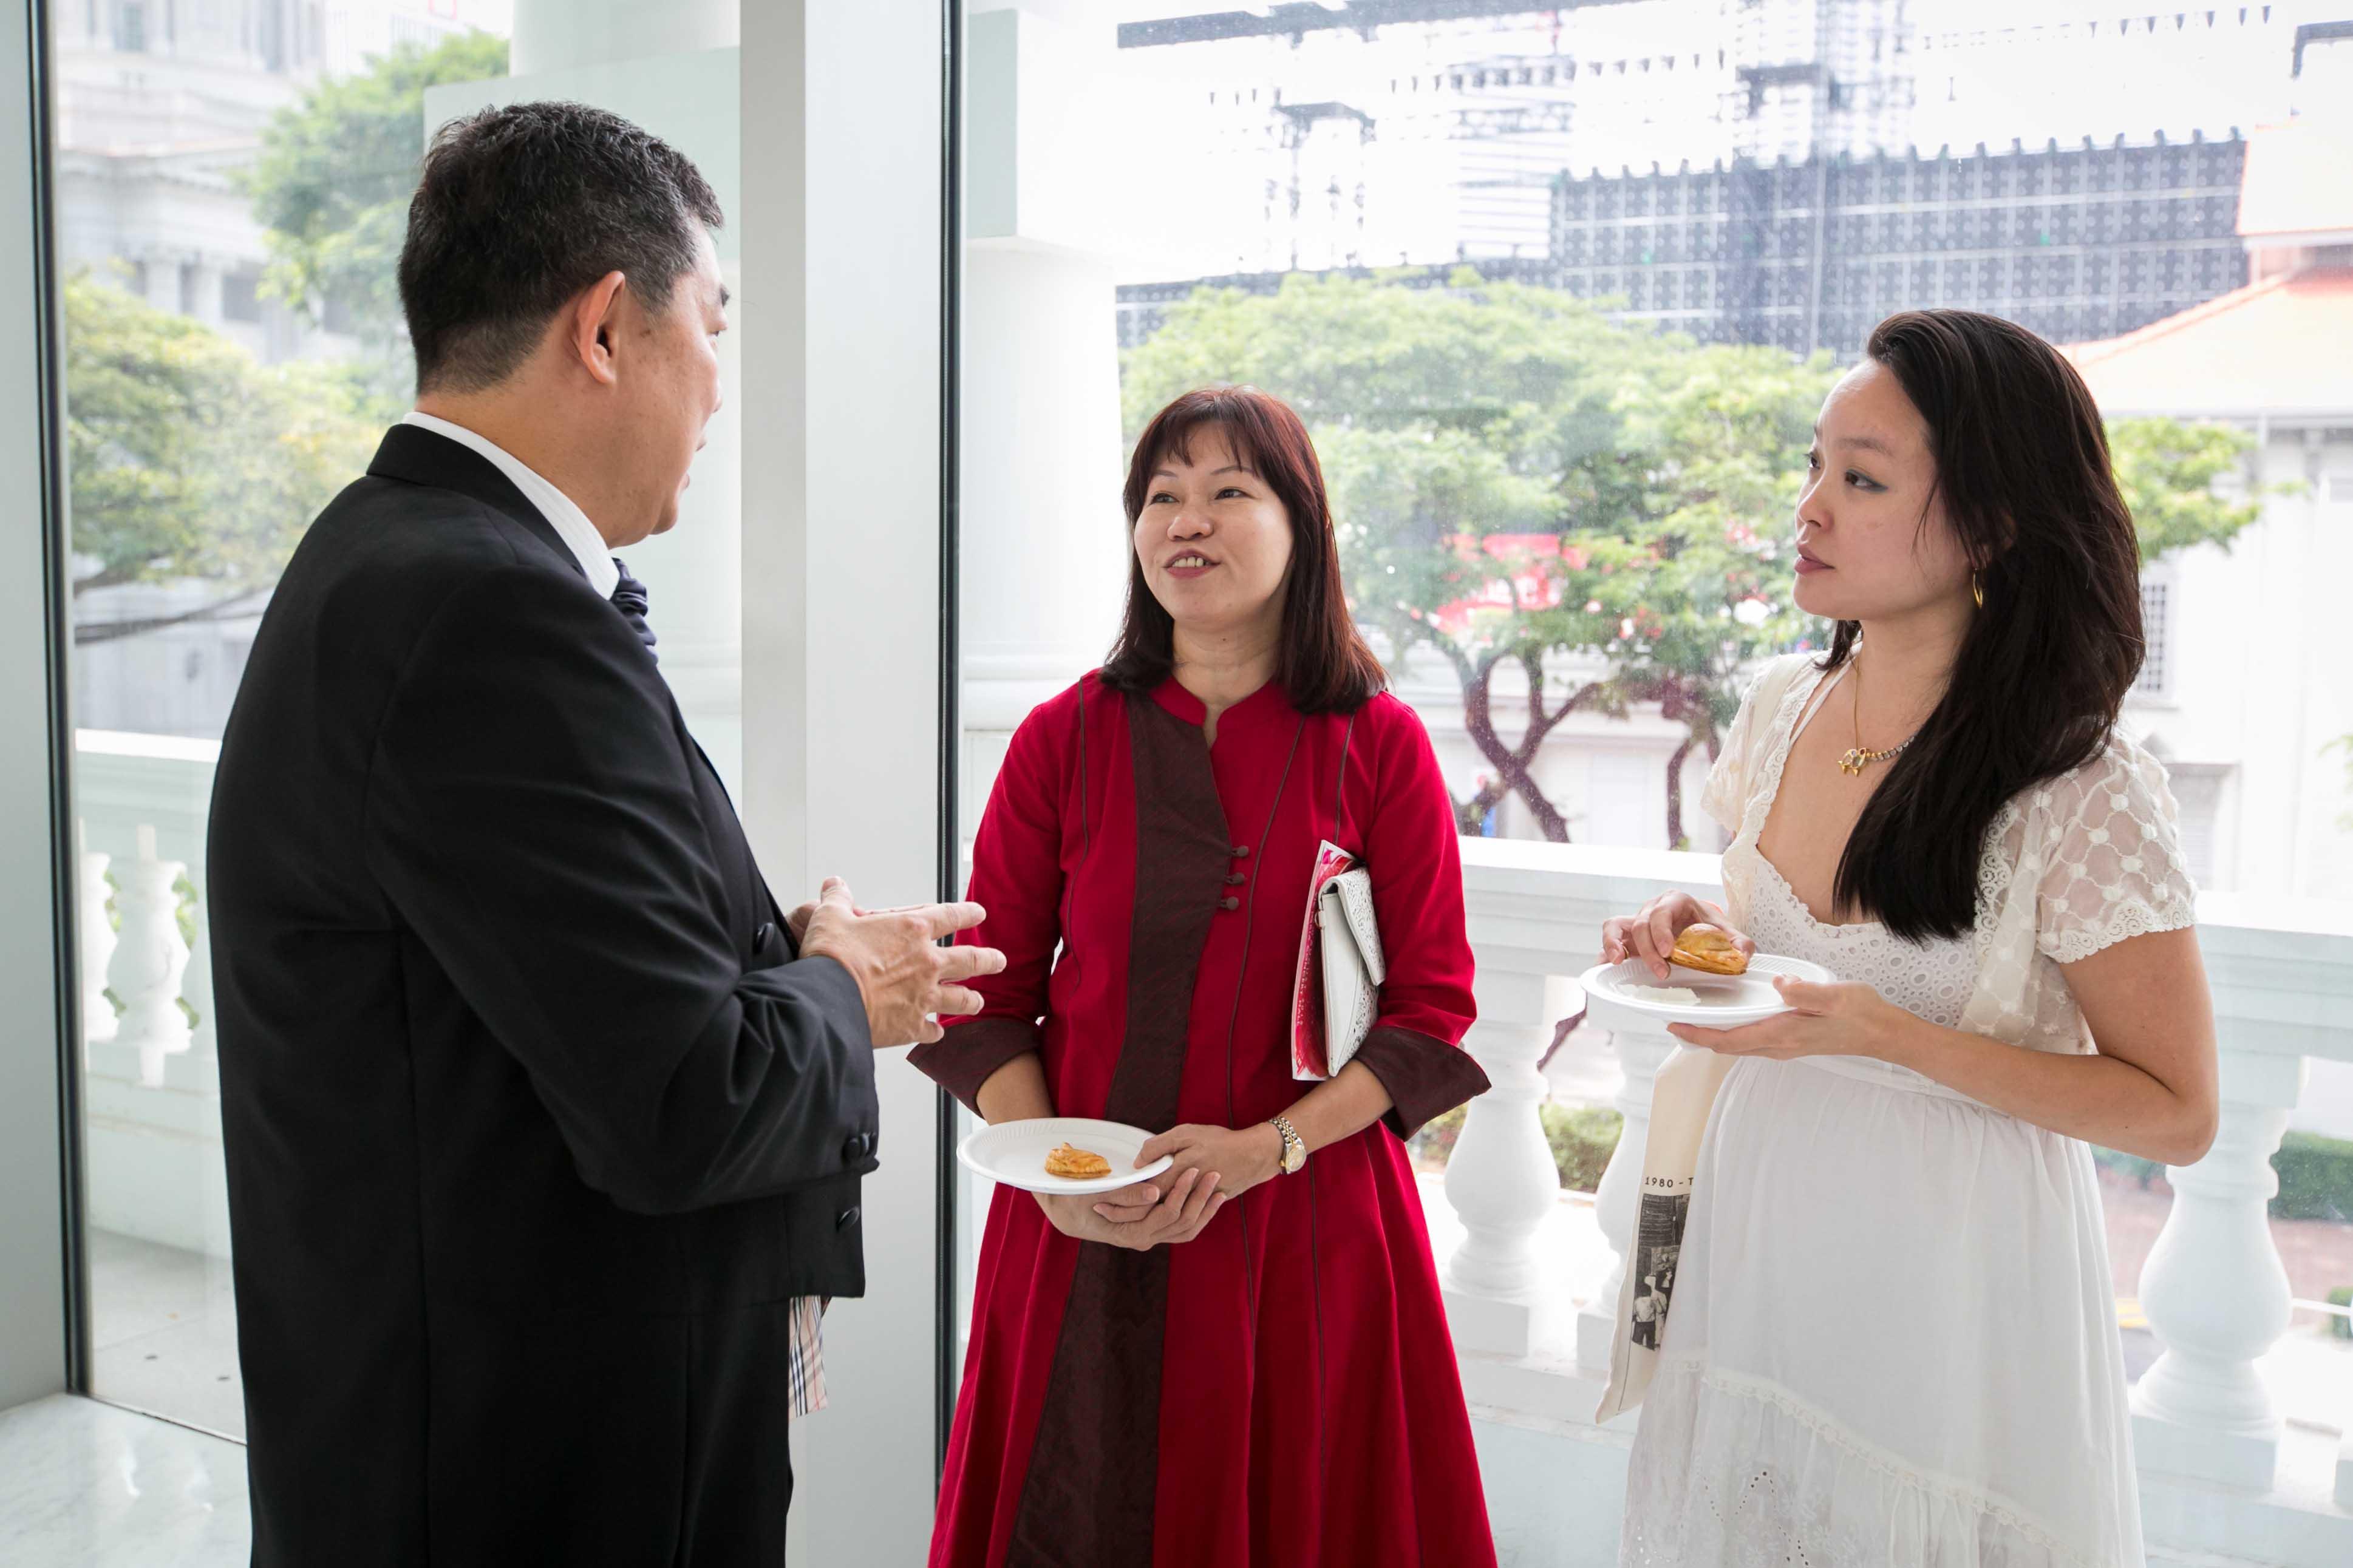 Singapore Choral Festival 8-8-15 (247).jpg